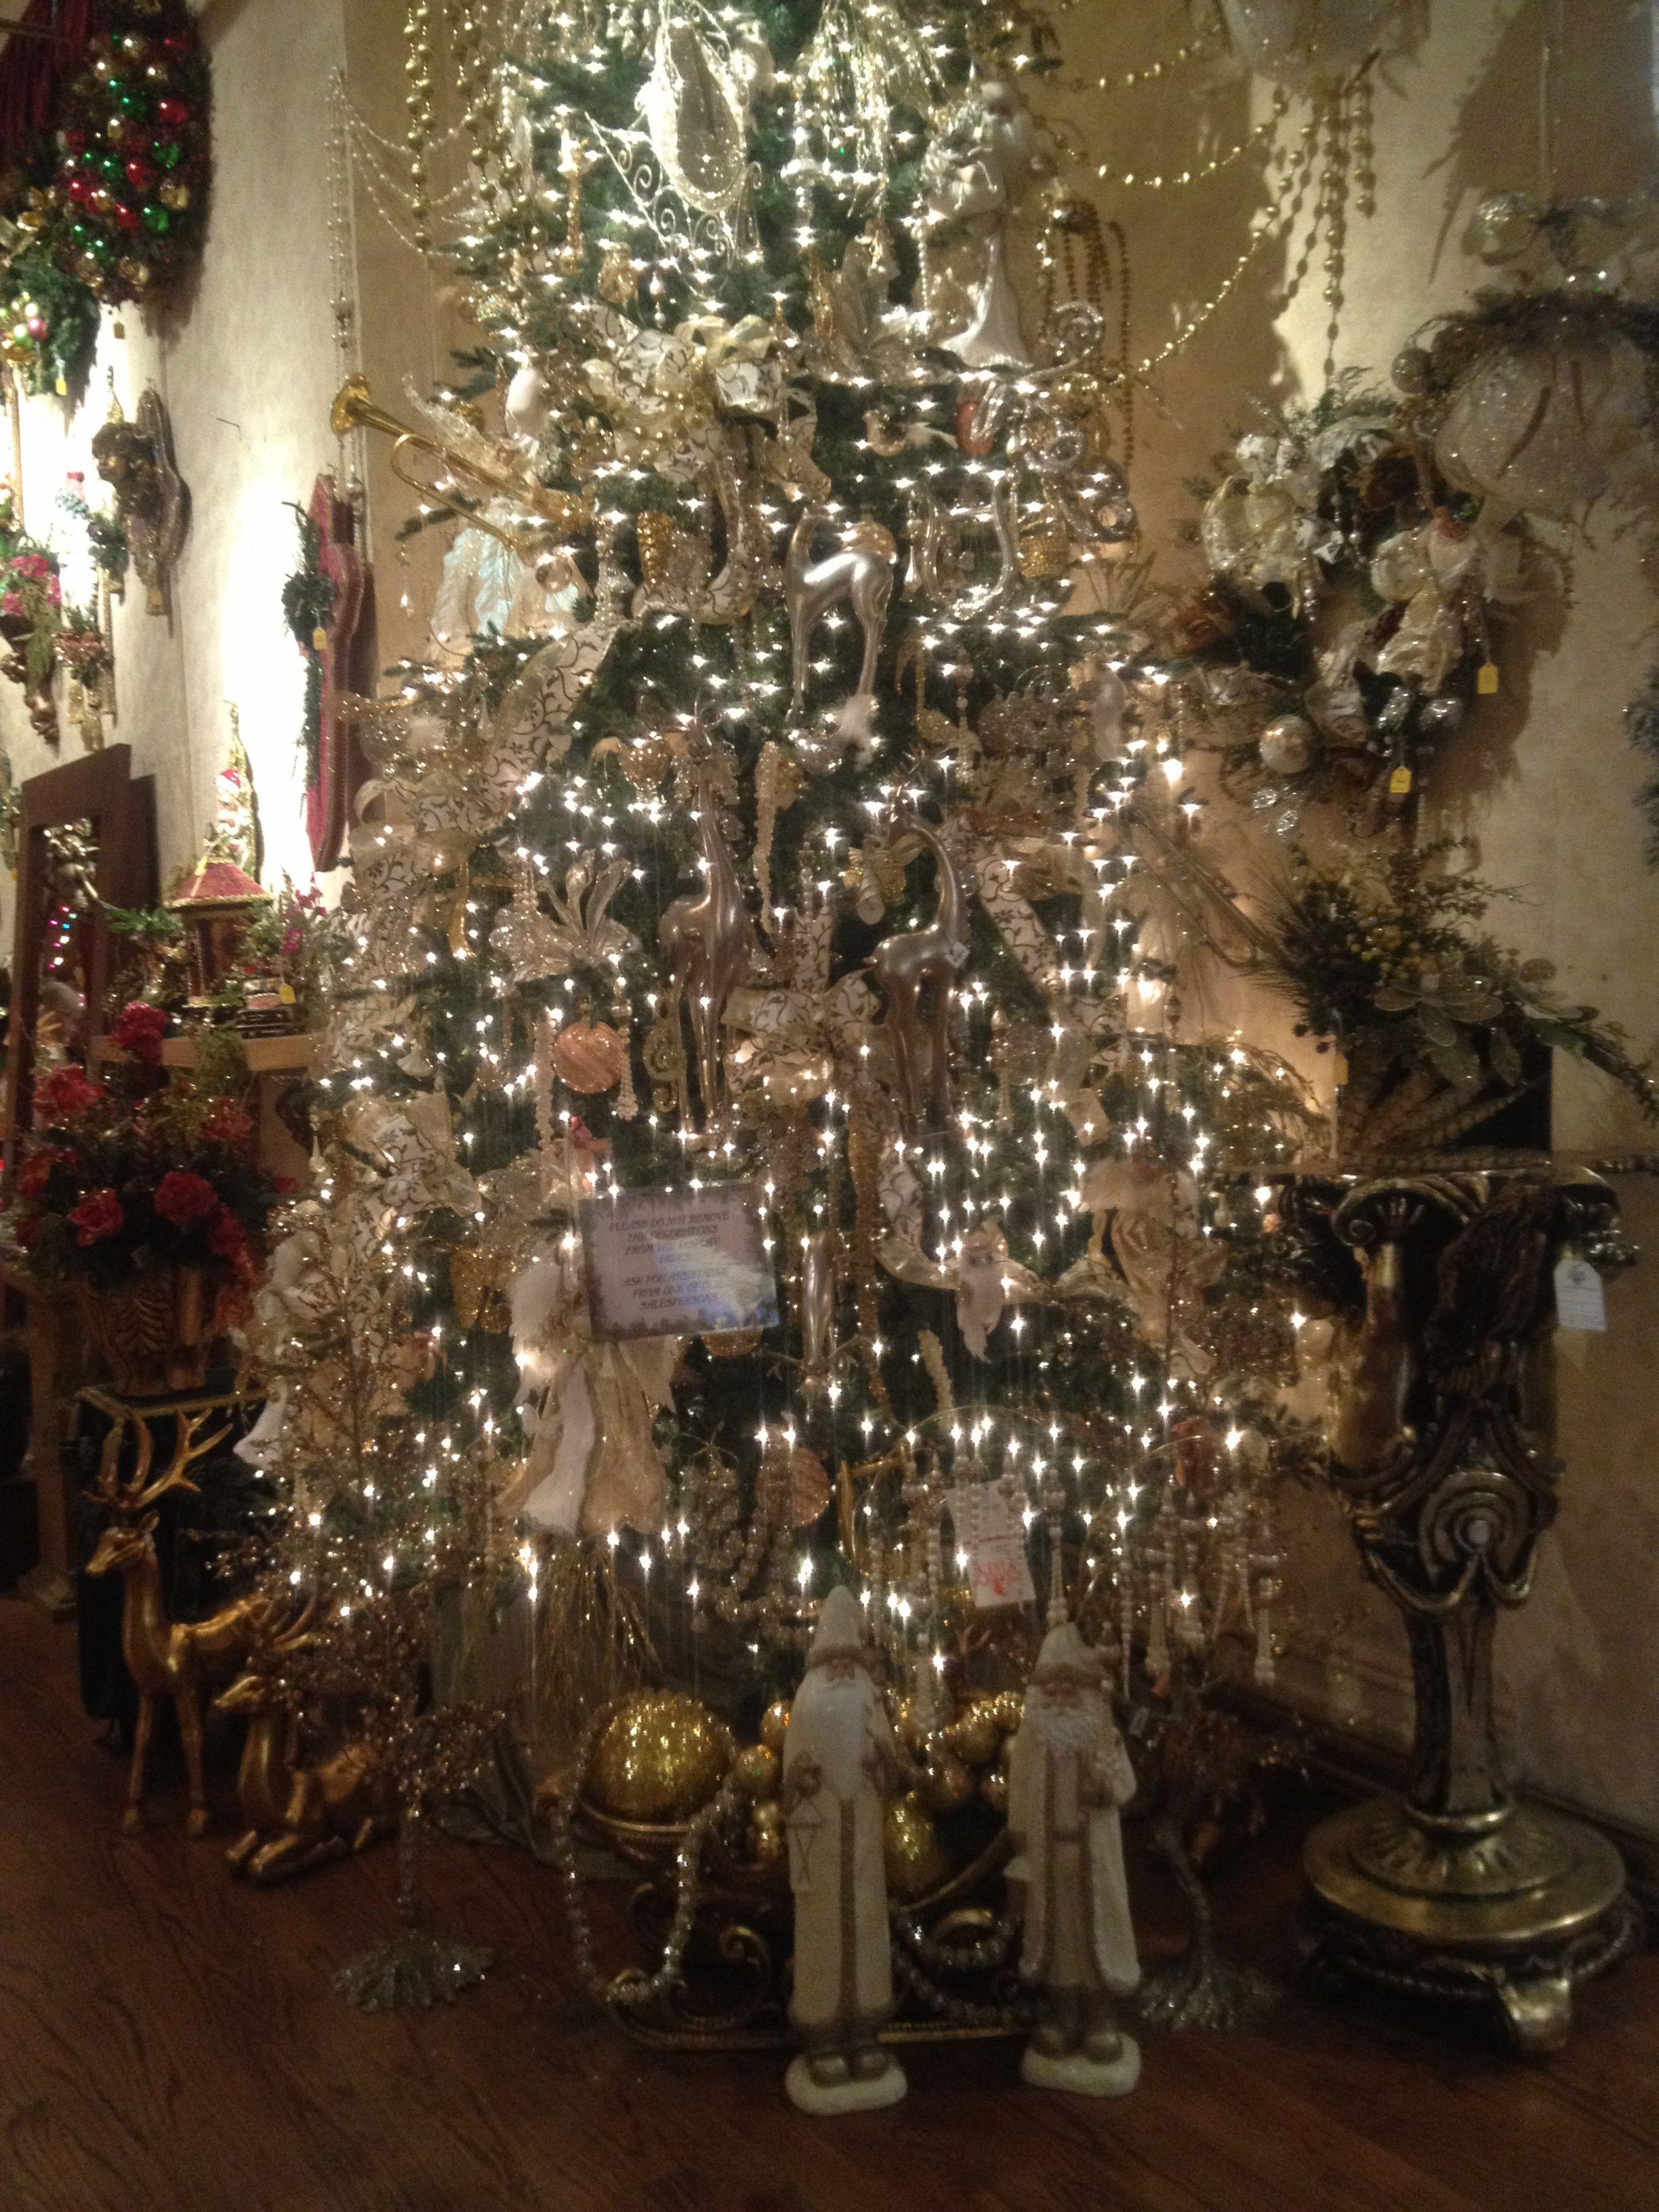 Christmas inspirations from Stats, Pasadena CA. White